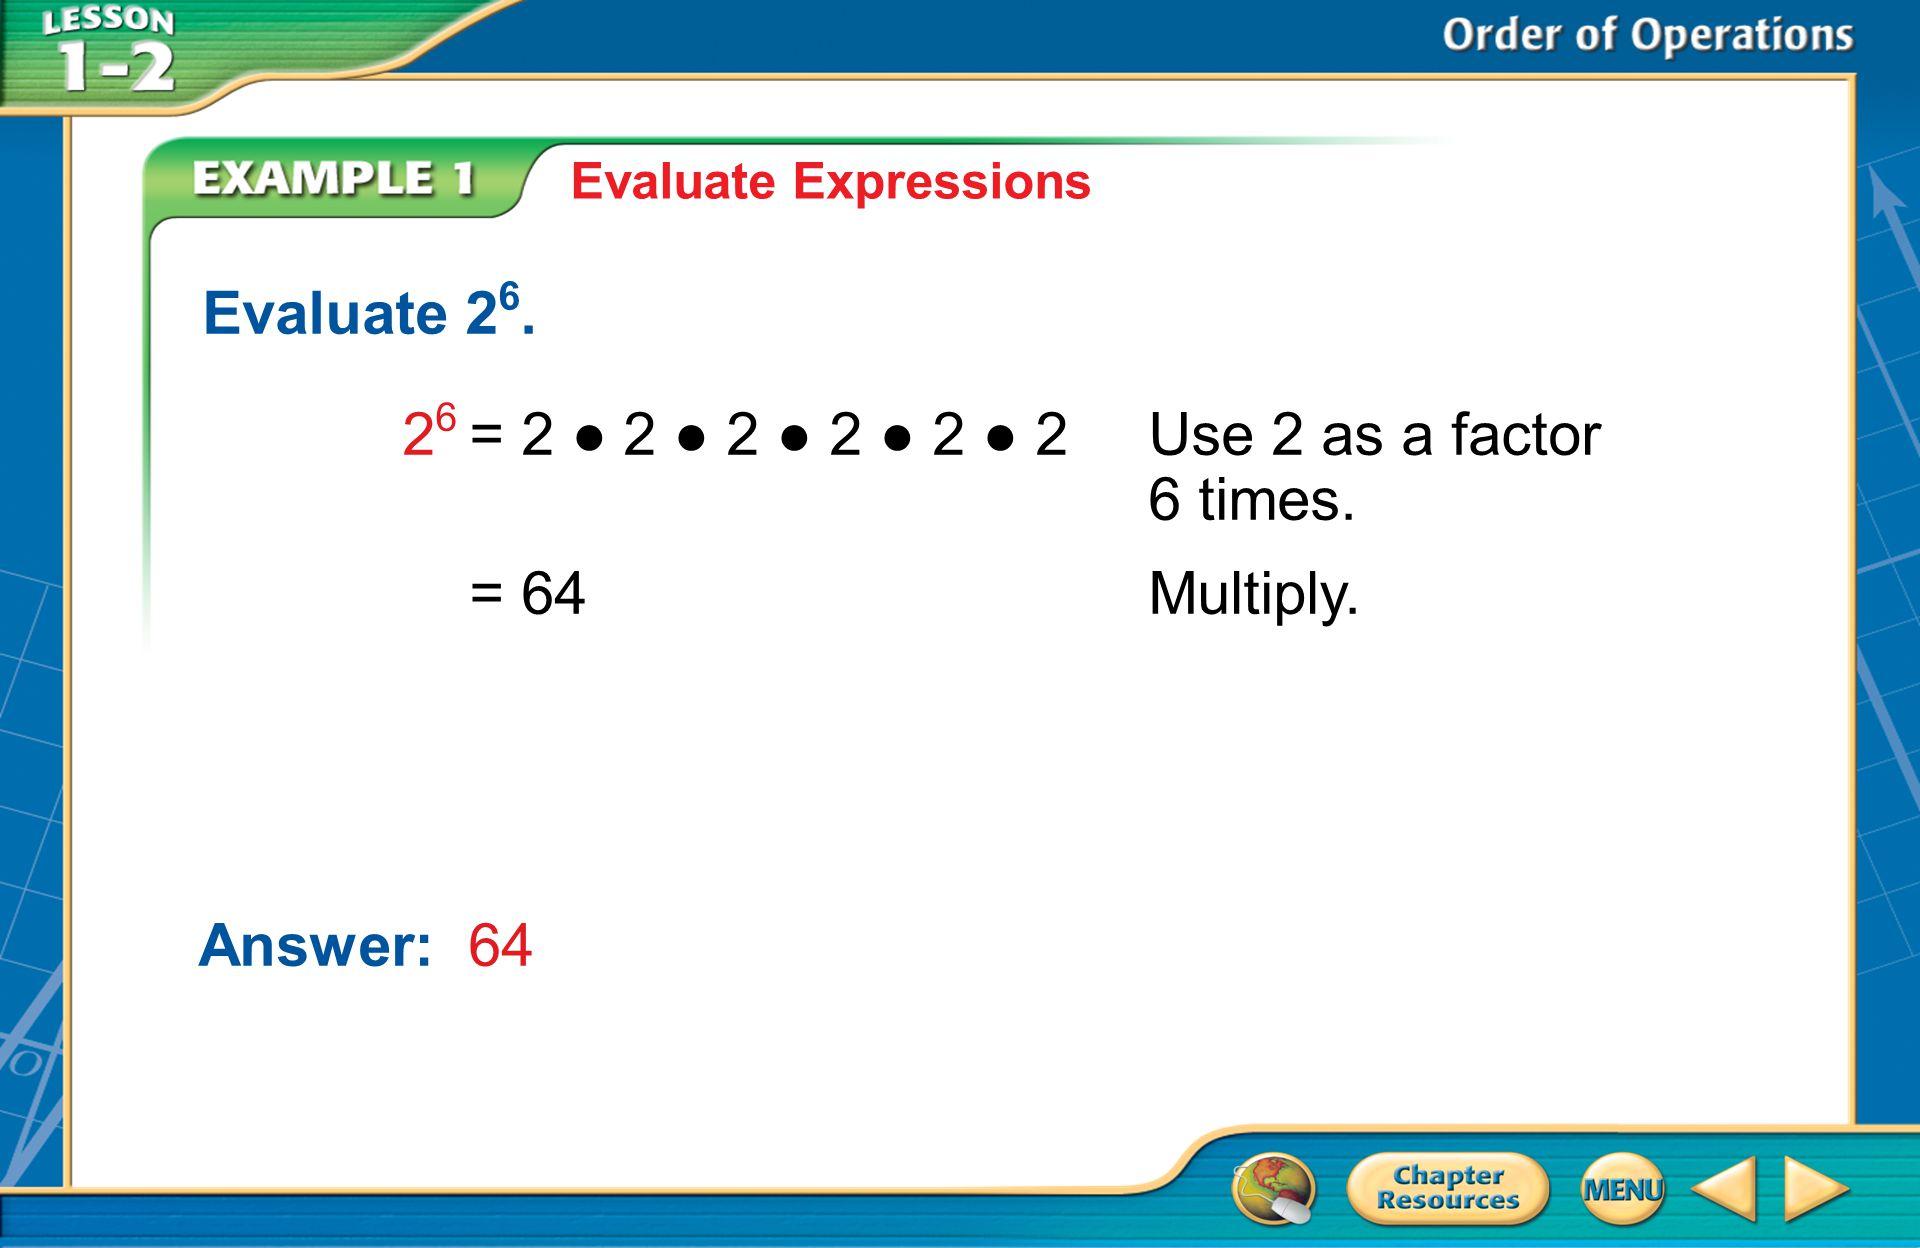 A.A B.B C.C D.D Example 3 A.–60 B.66 C.88 D.68 A. Evaluate the expression 2(4 + 7) (9 – 5).